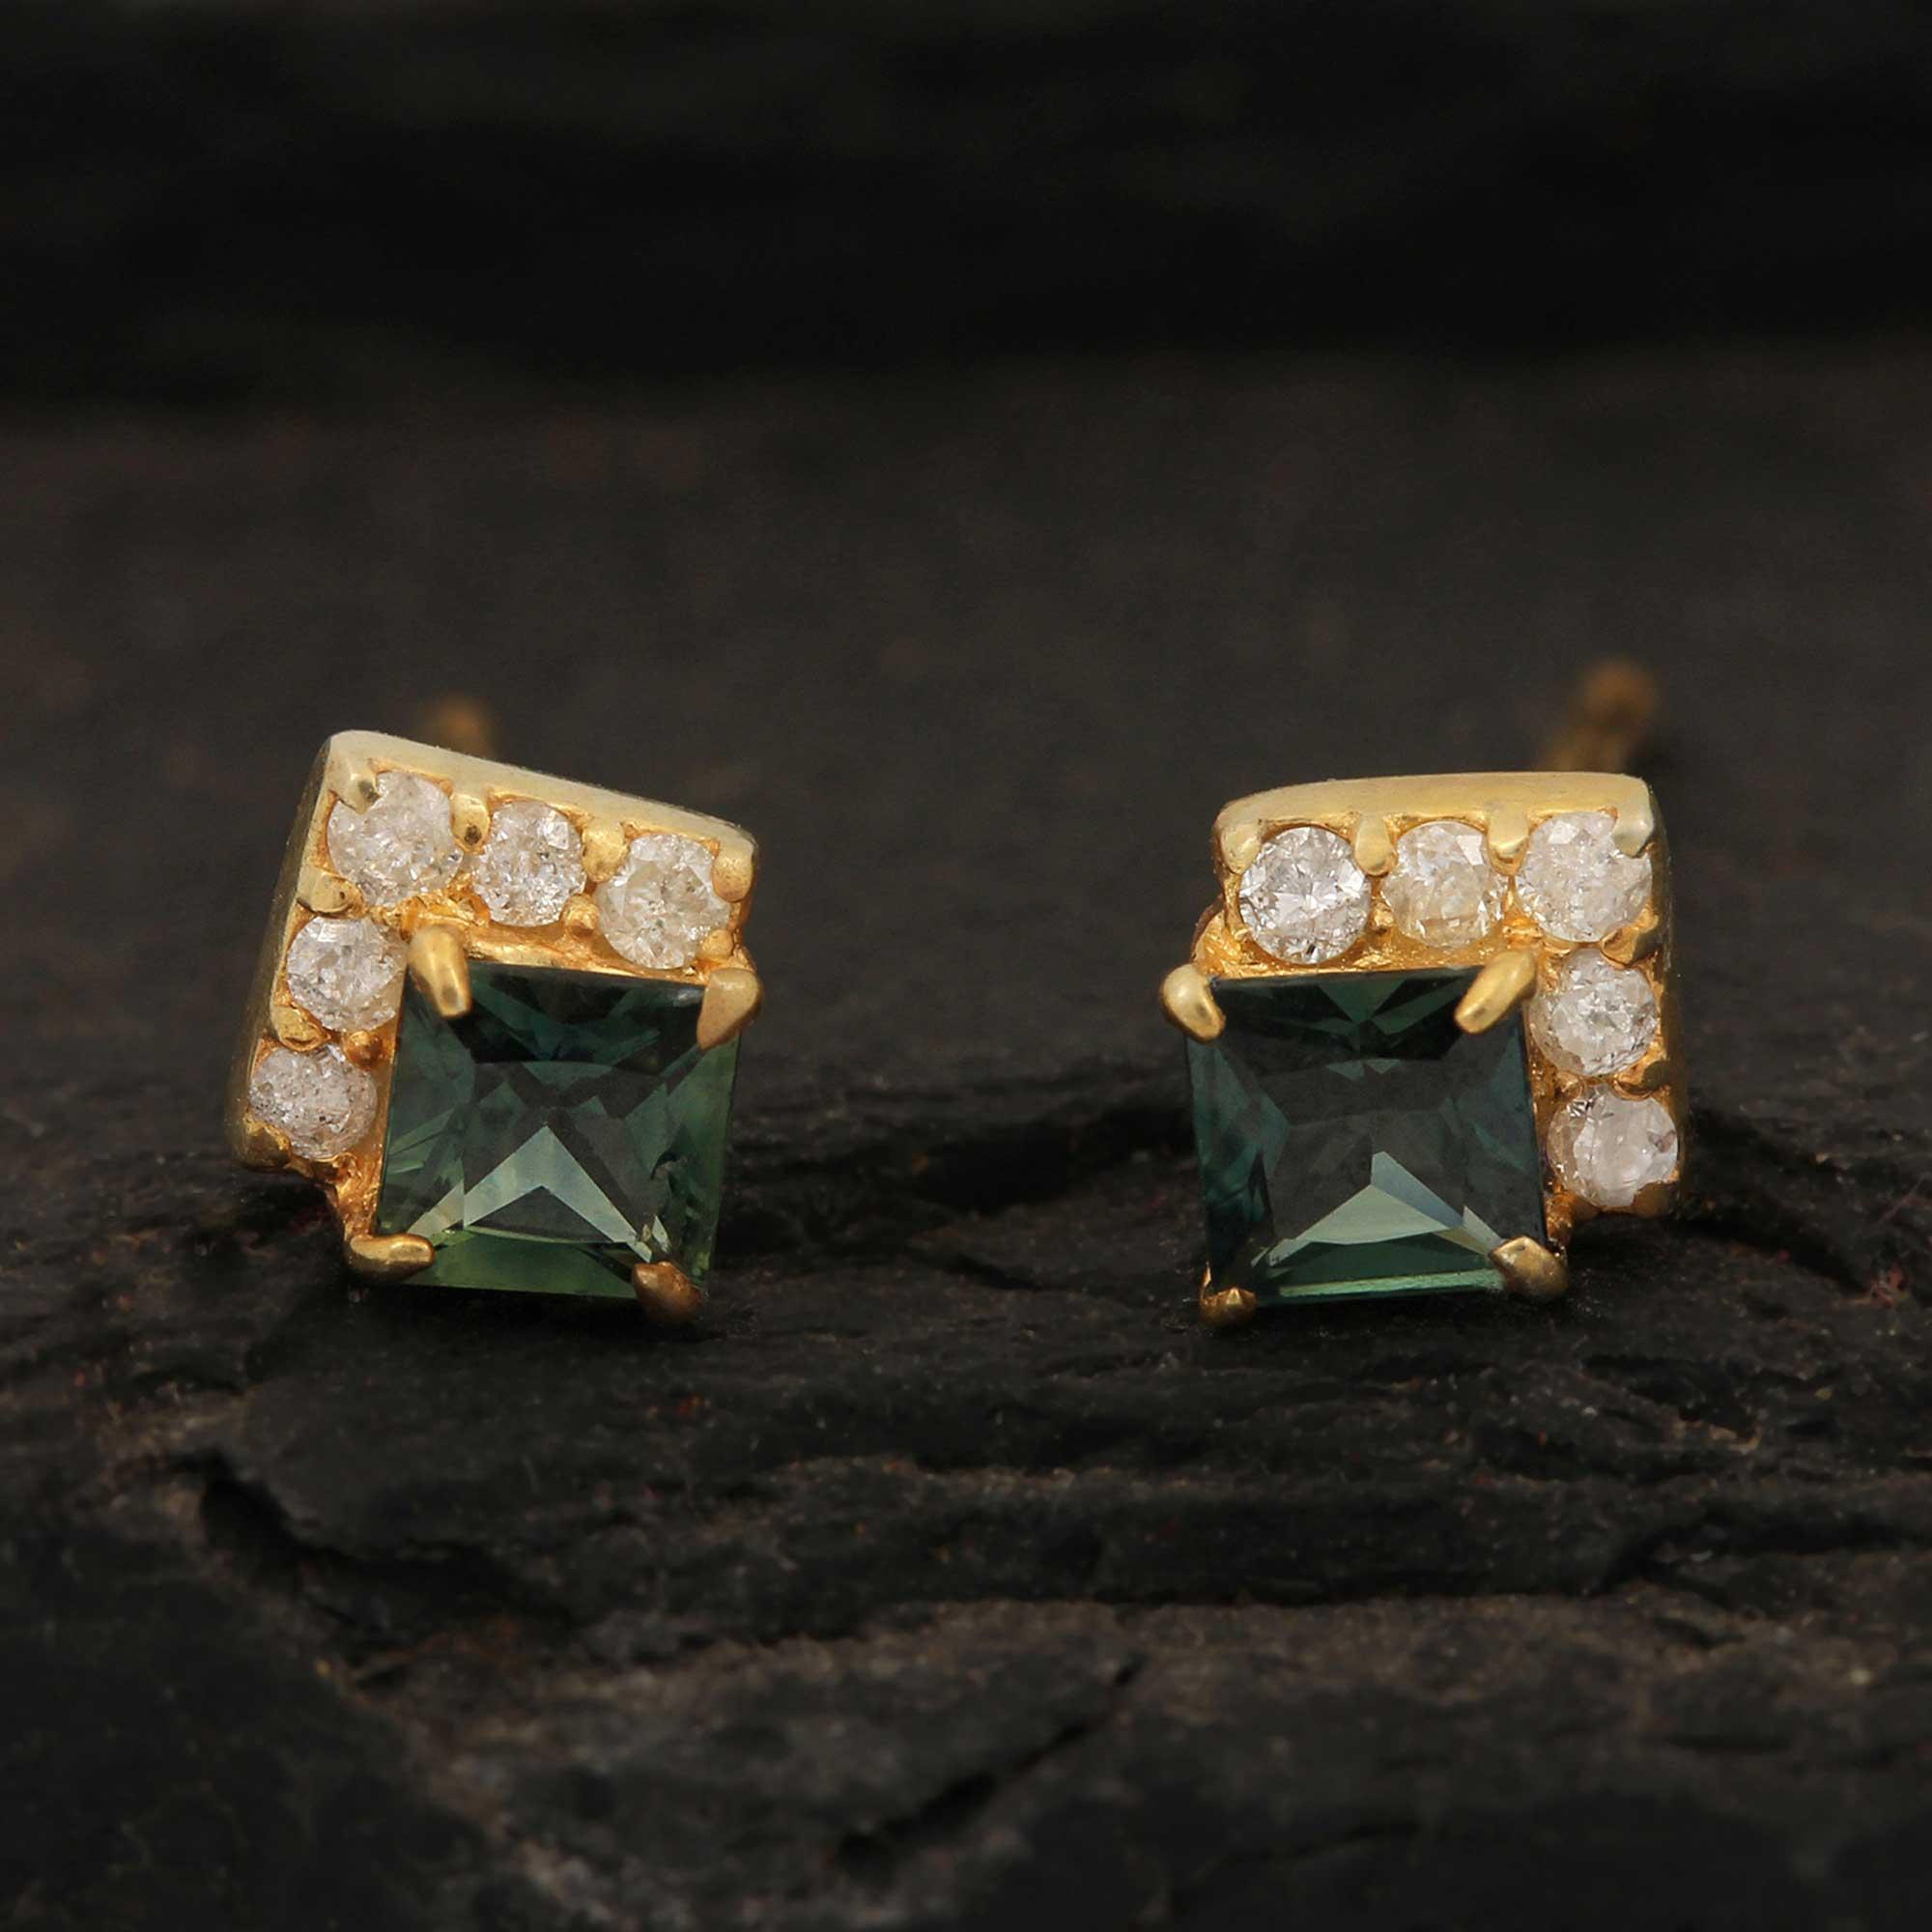 14k Solid Gold Natural Diamond Green Sapphire Minimalist Stud Earrings